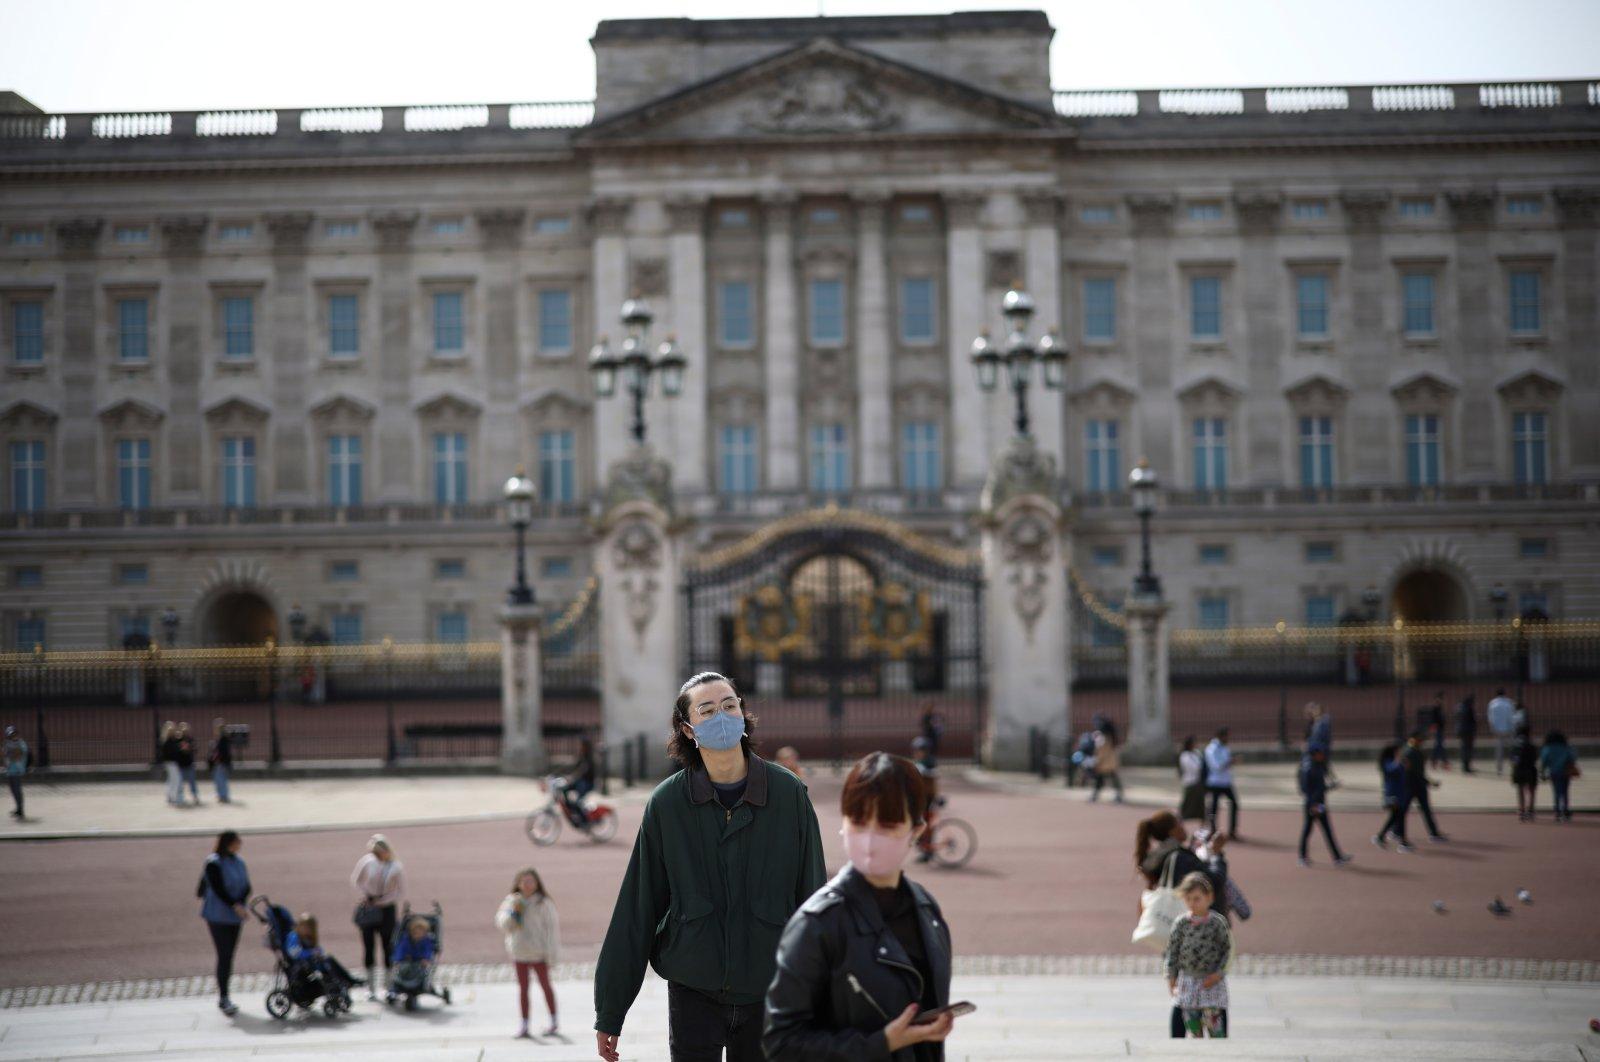 People visit Buckingham Palace, amid the coronavirus outbreak, in London, Britain, April 1, 2021. (Reuters Photo)